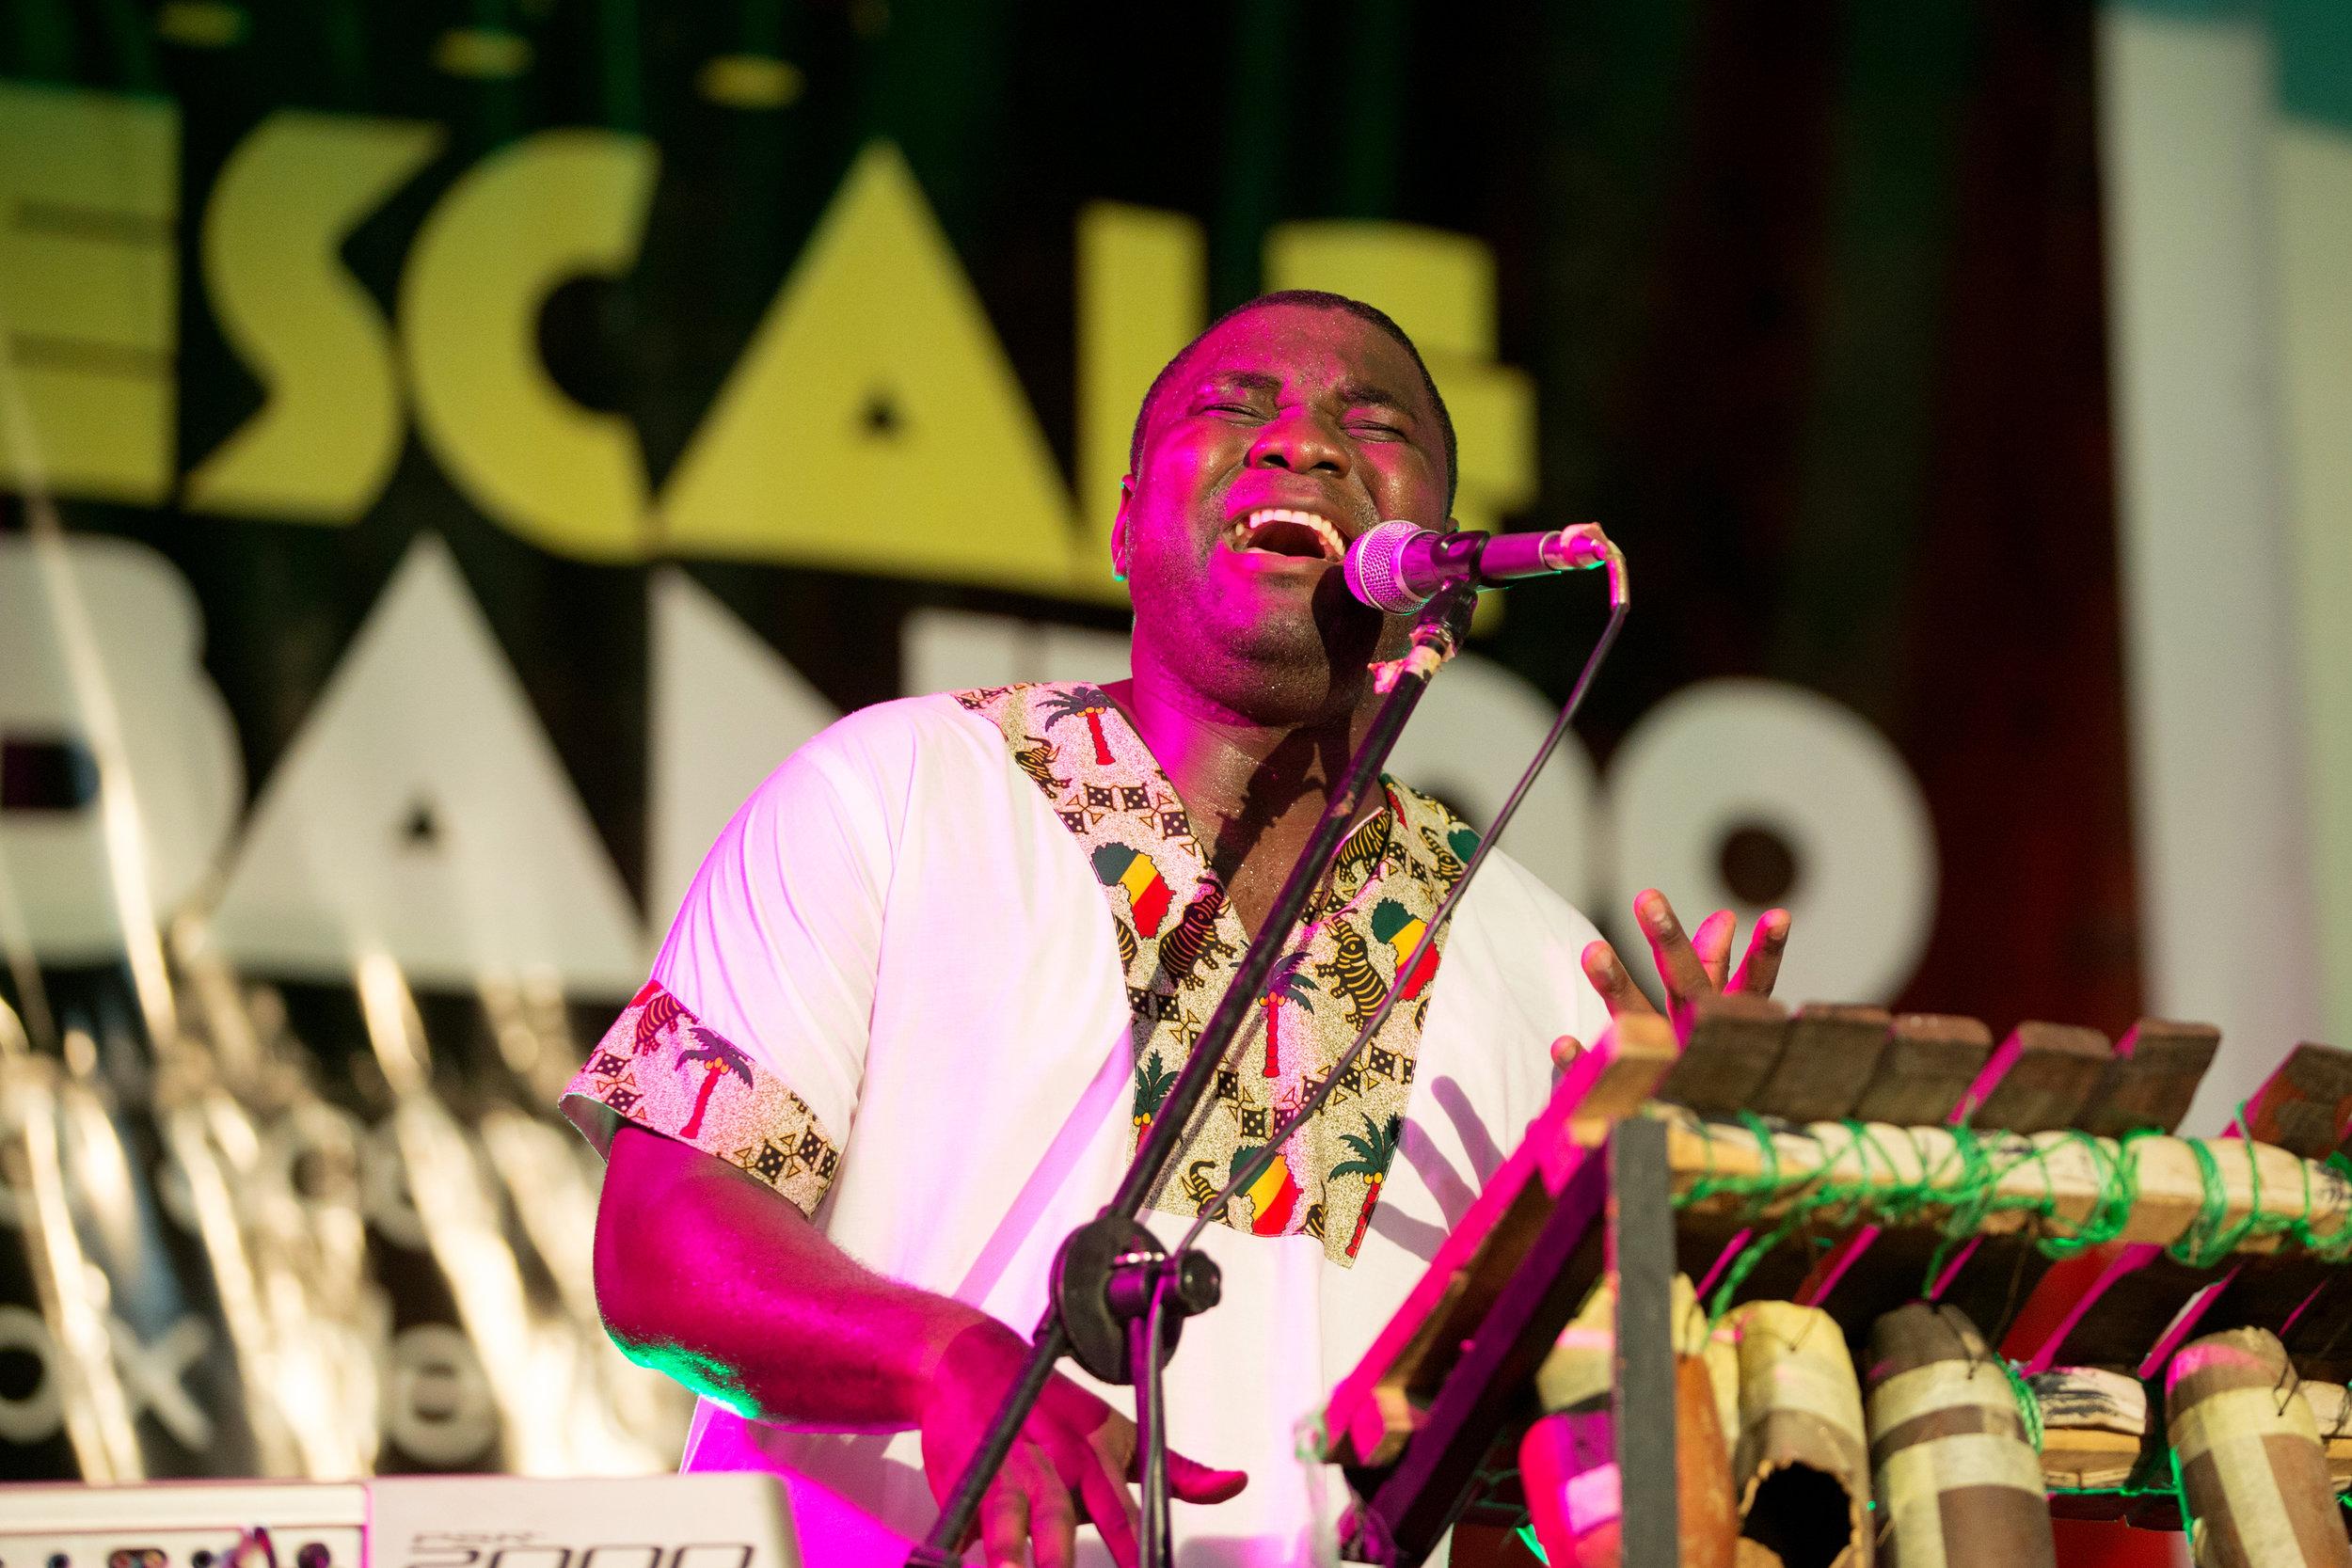 Armand Biyag from Cameroon at Escale Bantoo